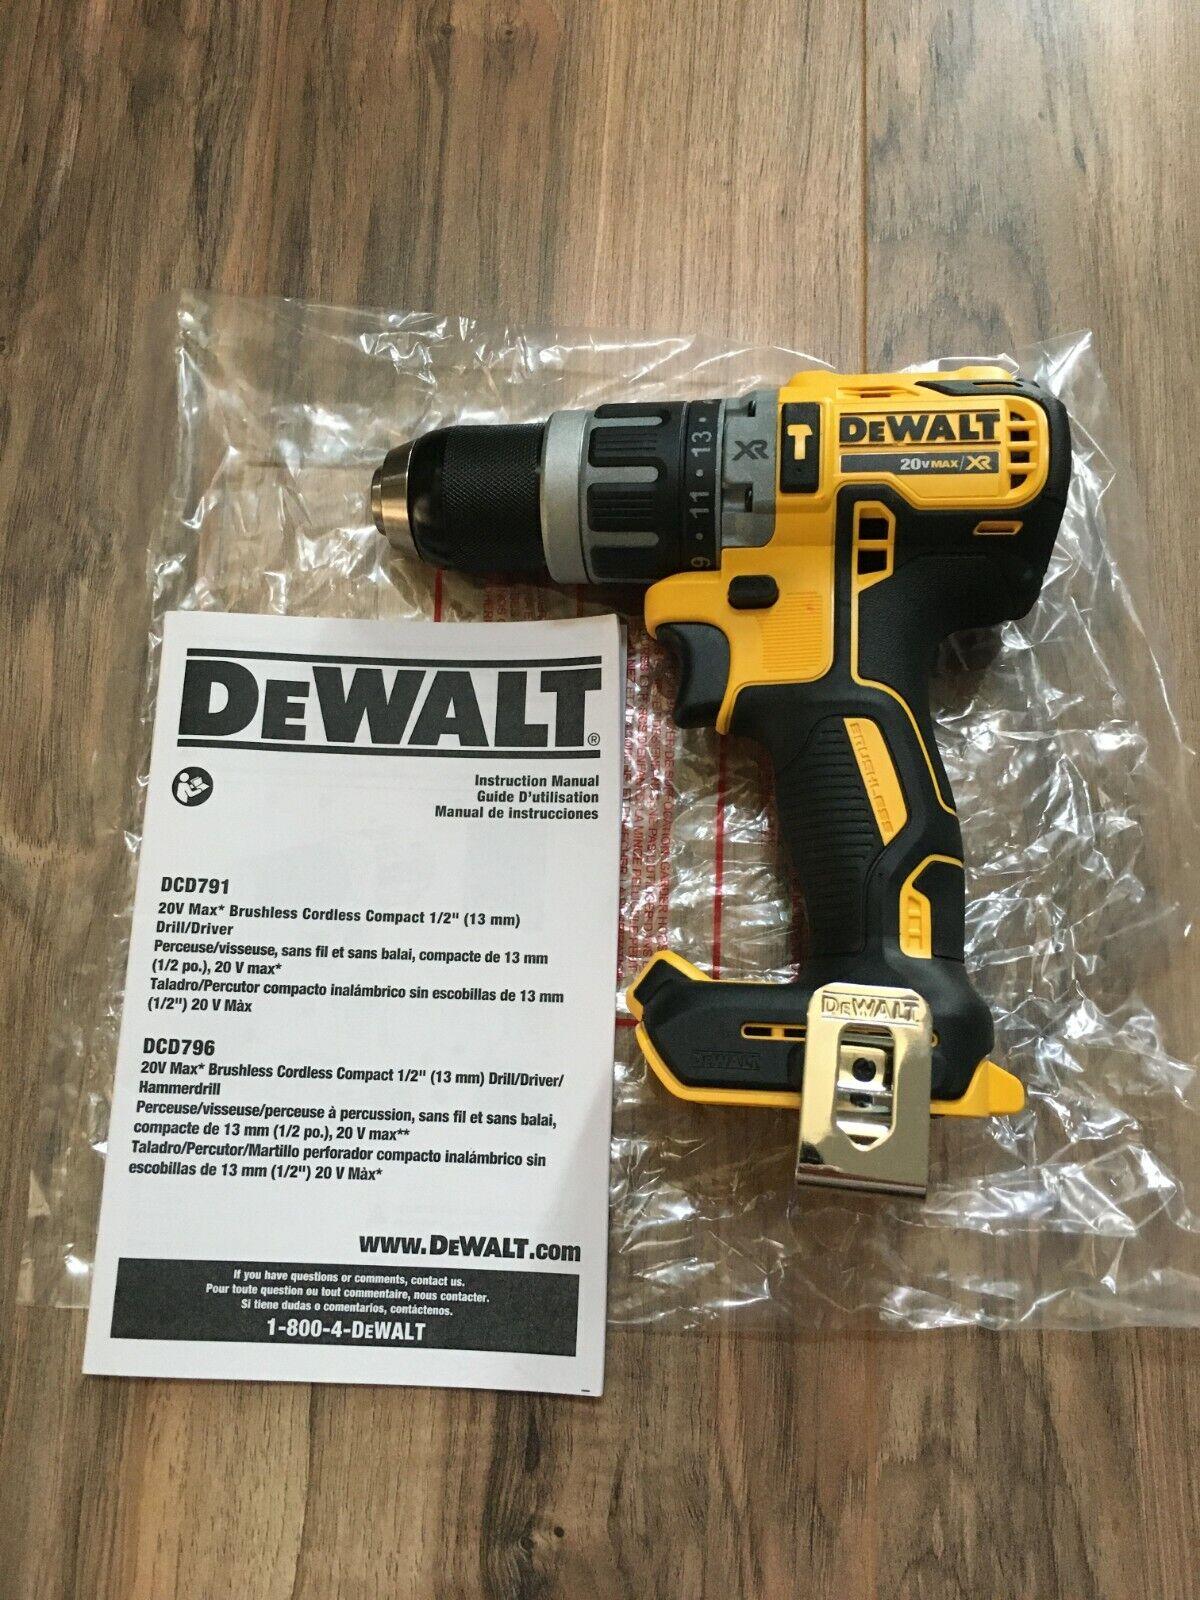 New Dewalt 20 Volt MAX XR Brushless Compact Hammer Drill DCD